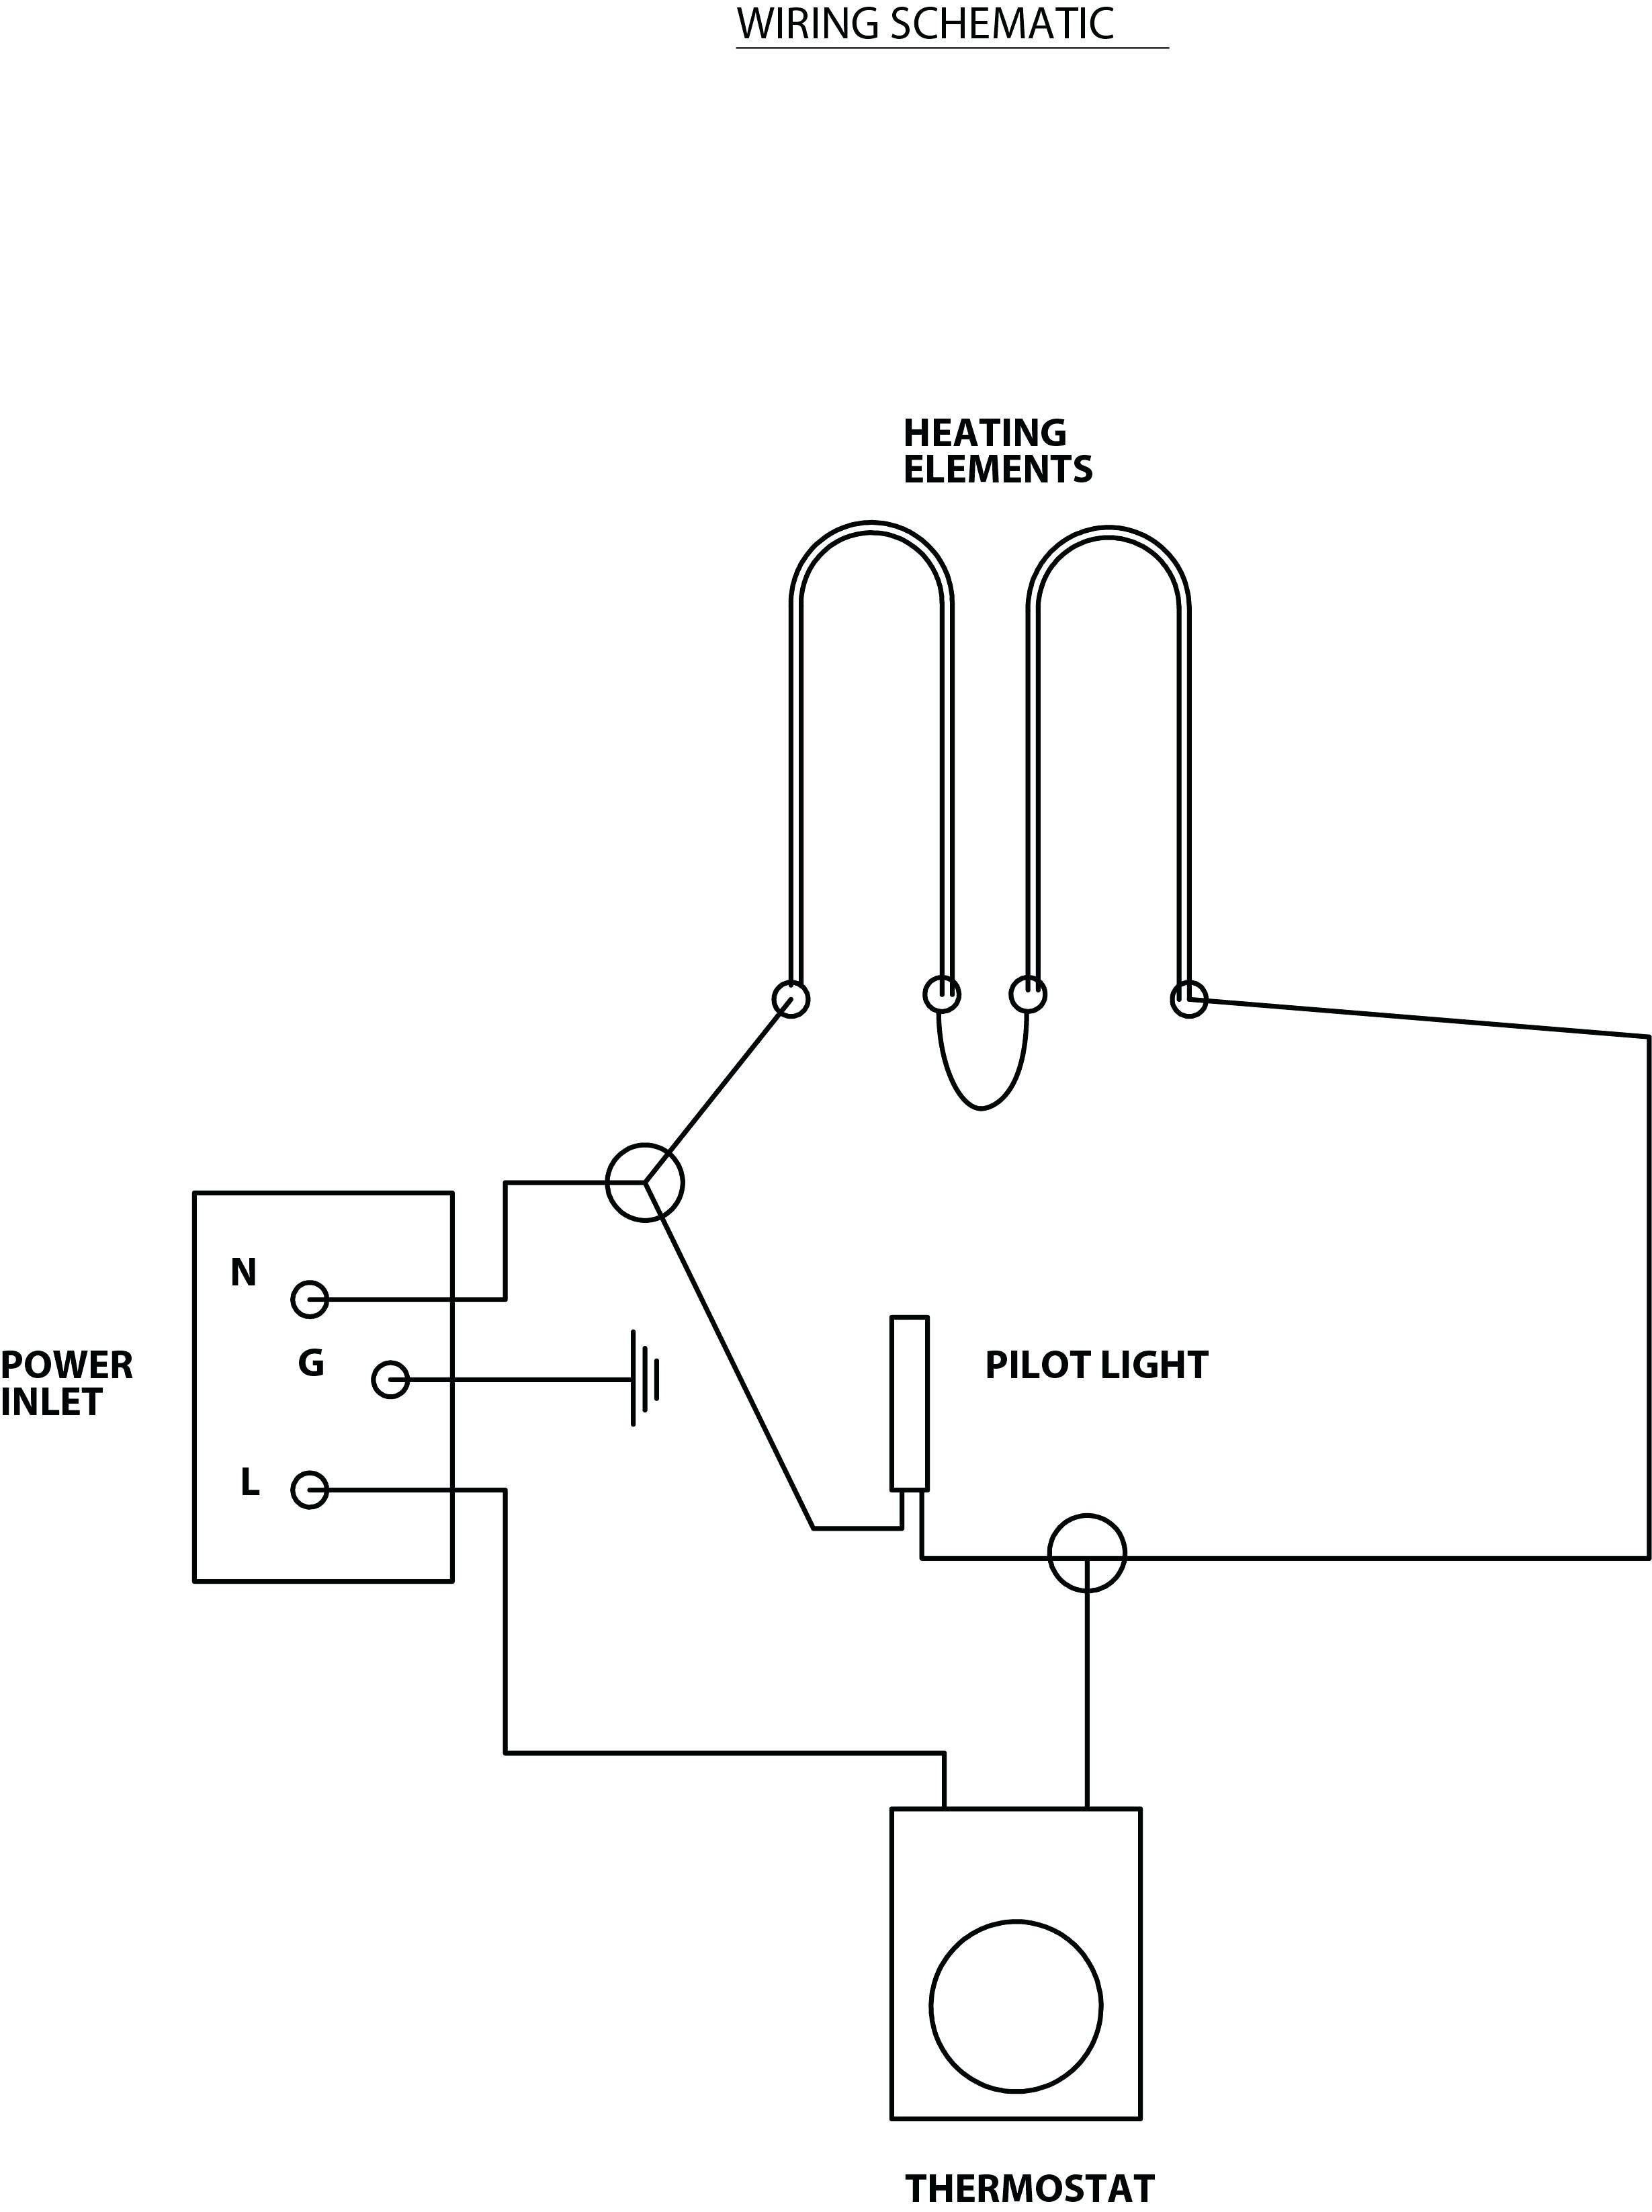 Unique Wiring Diagram For 220 Volt Baseboard Heater Diagram Diagramtemplate Diagramsample